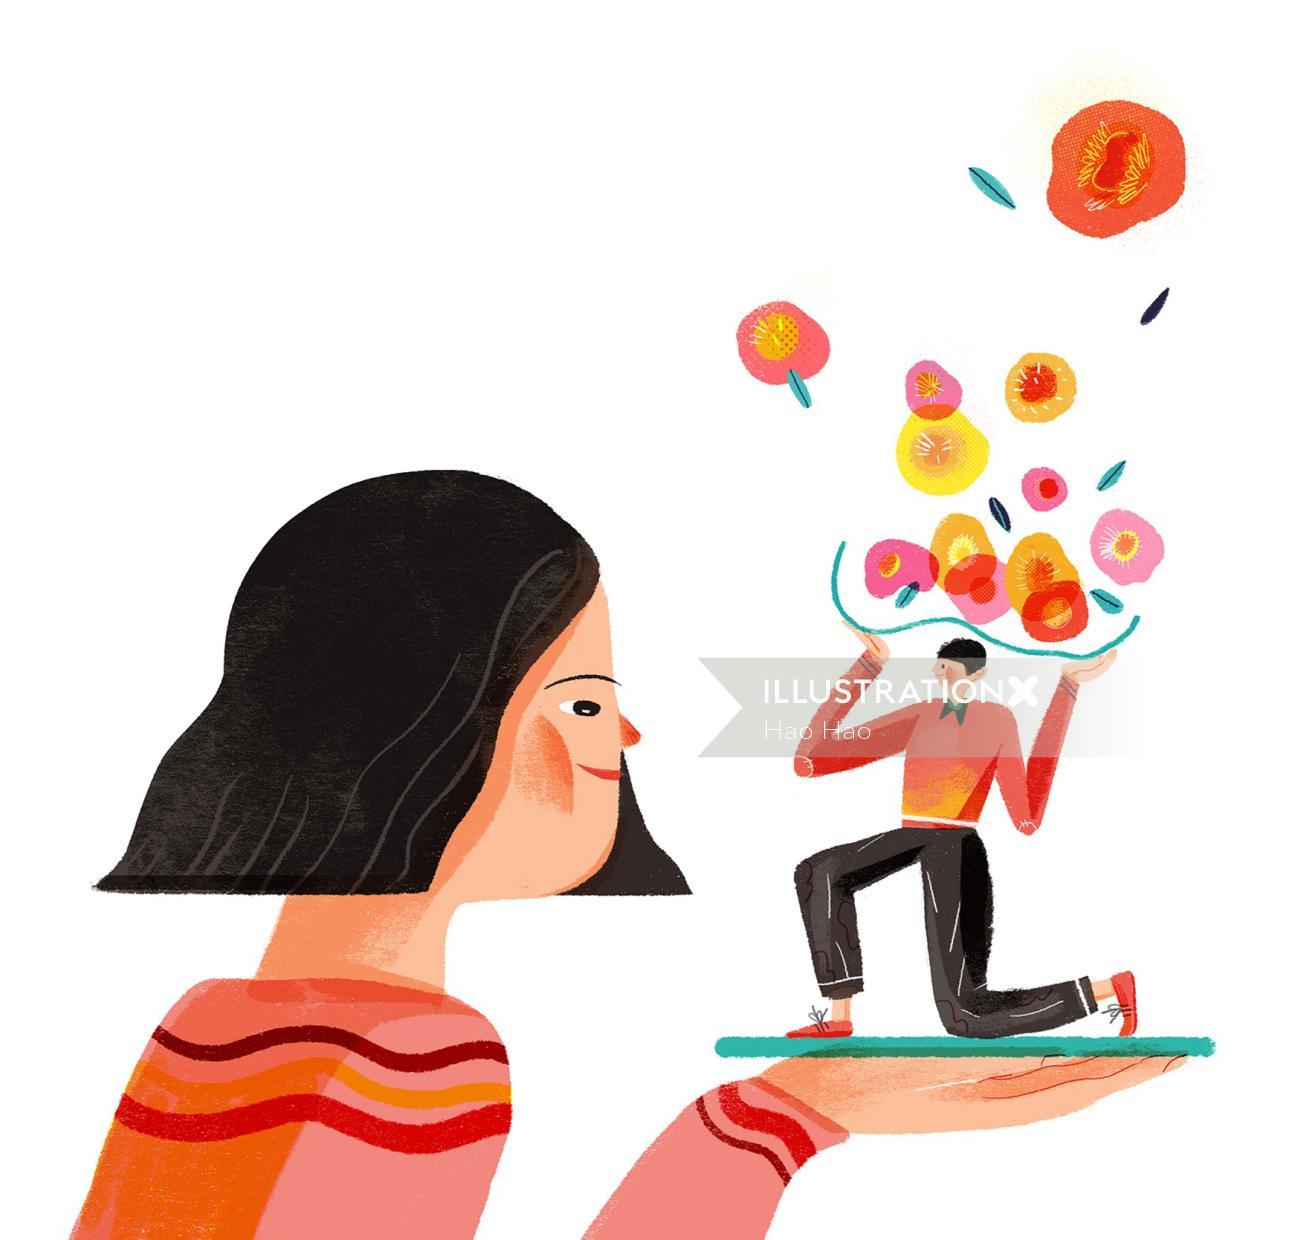 Contemporary illustration by Hao Hao